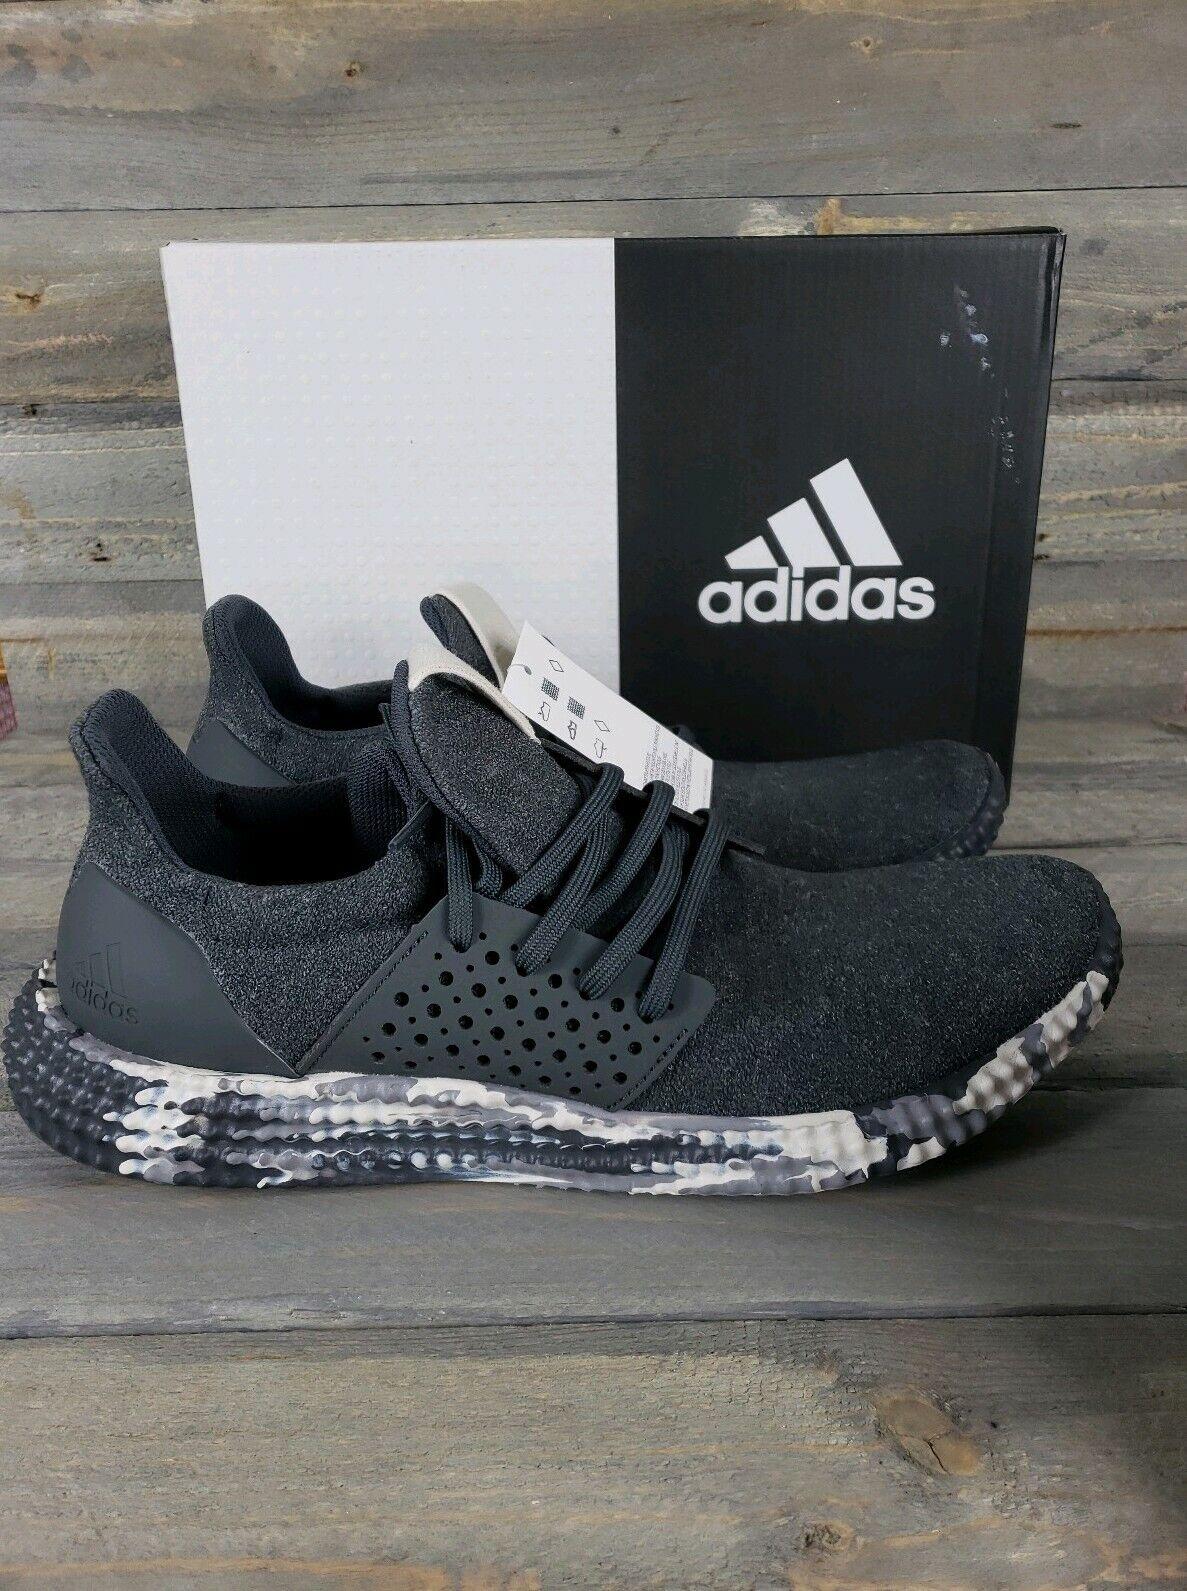 Adidas Original Mens Athletics  24 7 TR M Training shoes BD7228 Sz 9